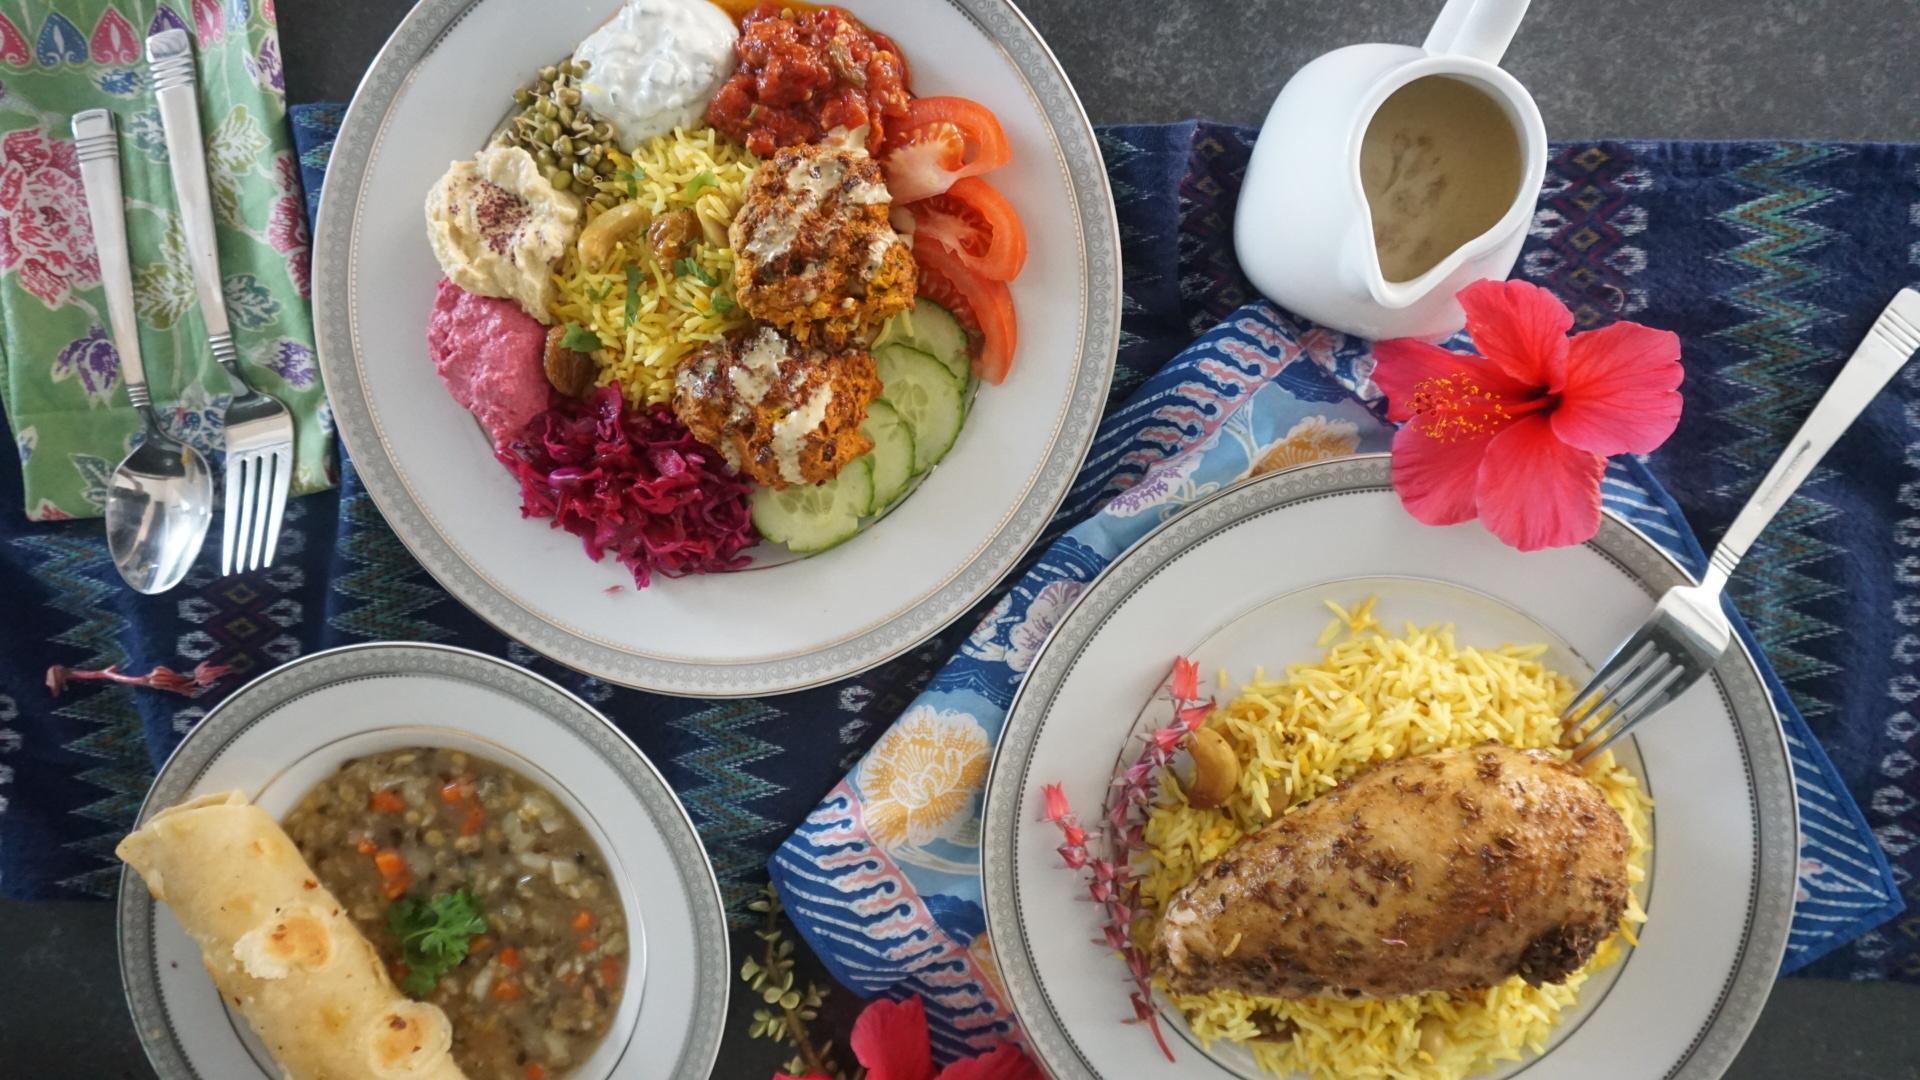 Medicinal Super Bowl, Pumpkin Veggie Bhaji, Cumin Spiced Organic Chicken, Medicinal Rice, Lentil Soup, Homemade Garlic Roti